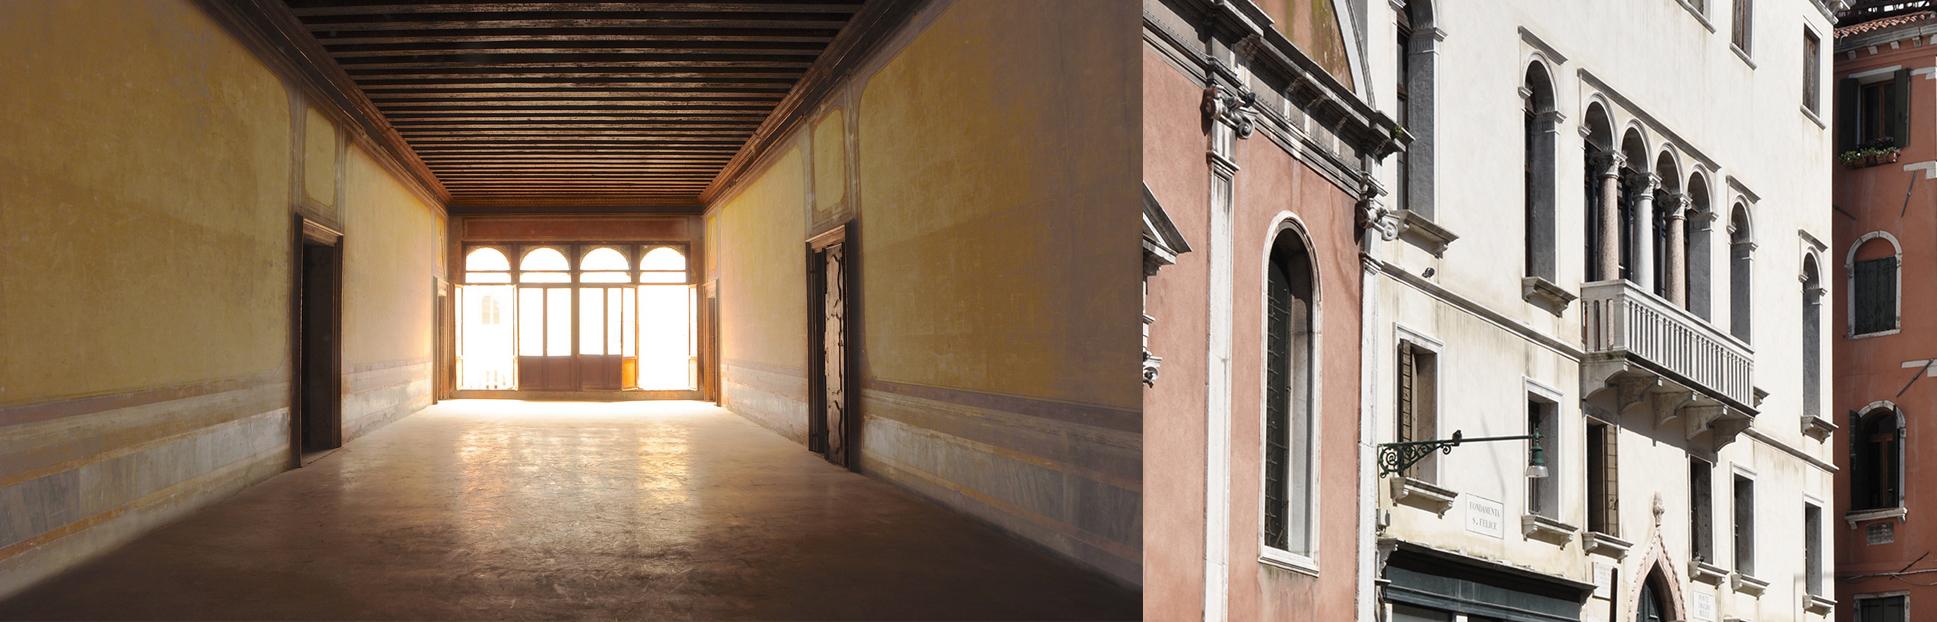 palazzo mora composite web copy